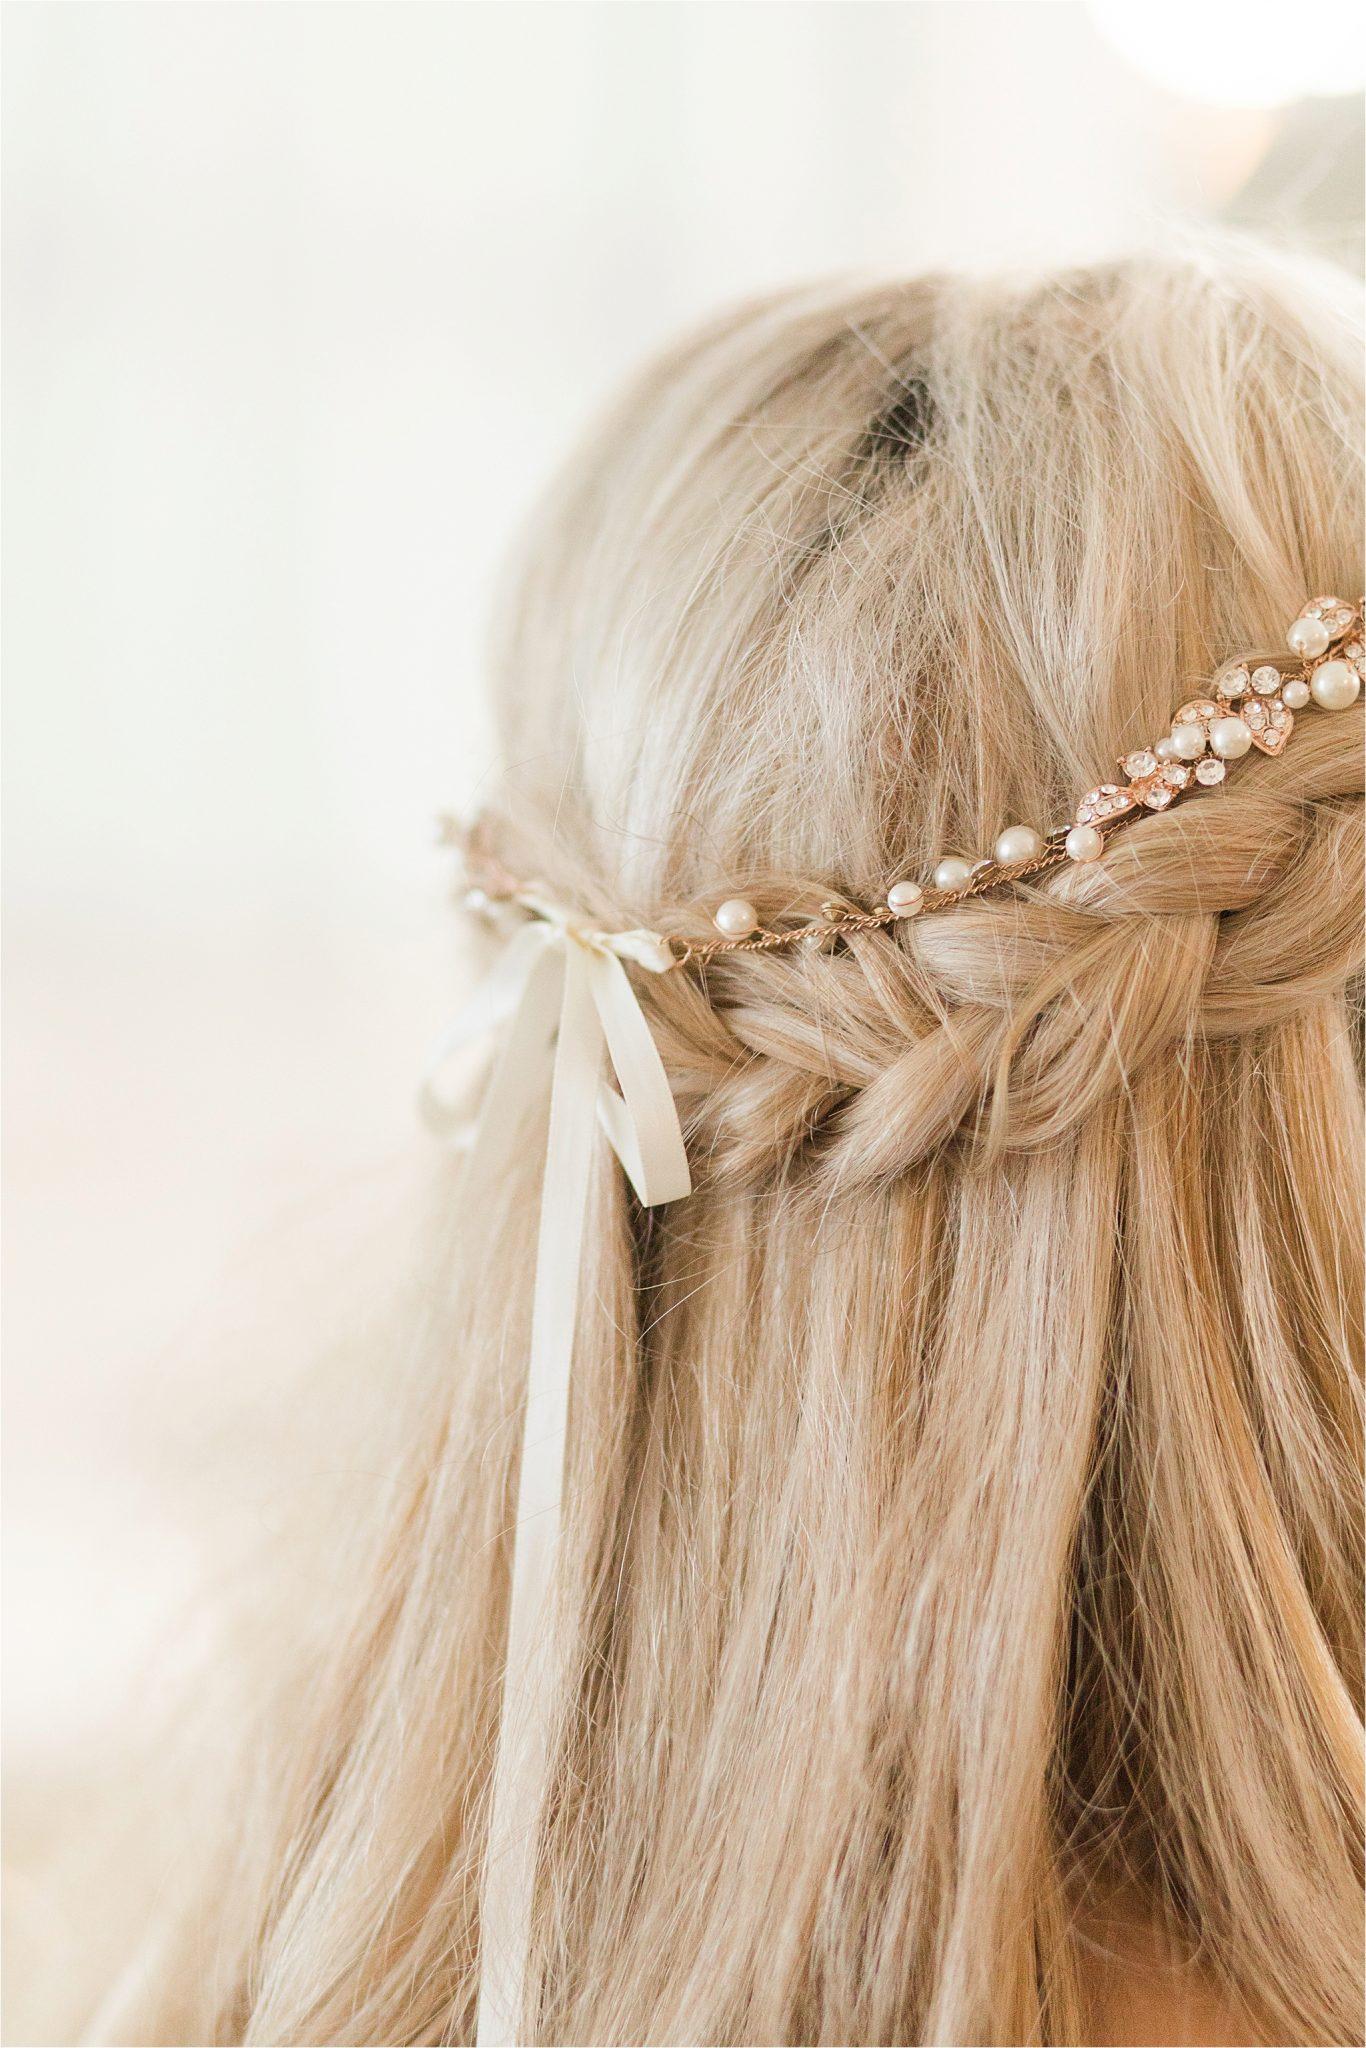 bridal-hair-braid-half-up-down-pearl-crown-bow-blonde-style-ivory